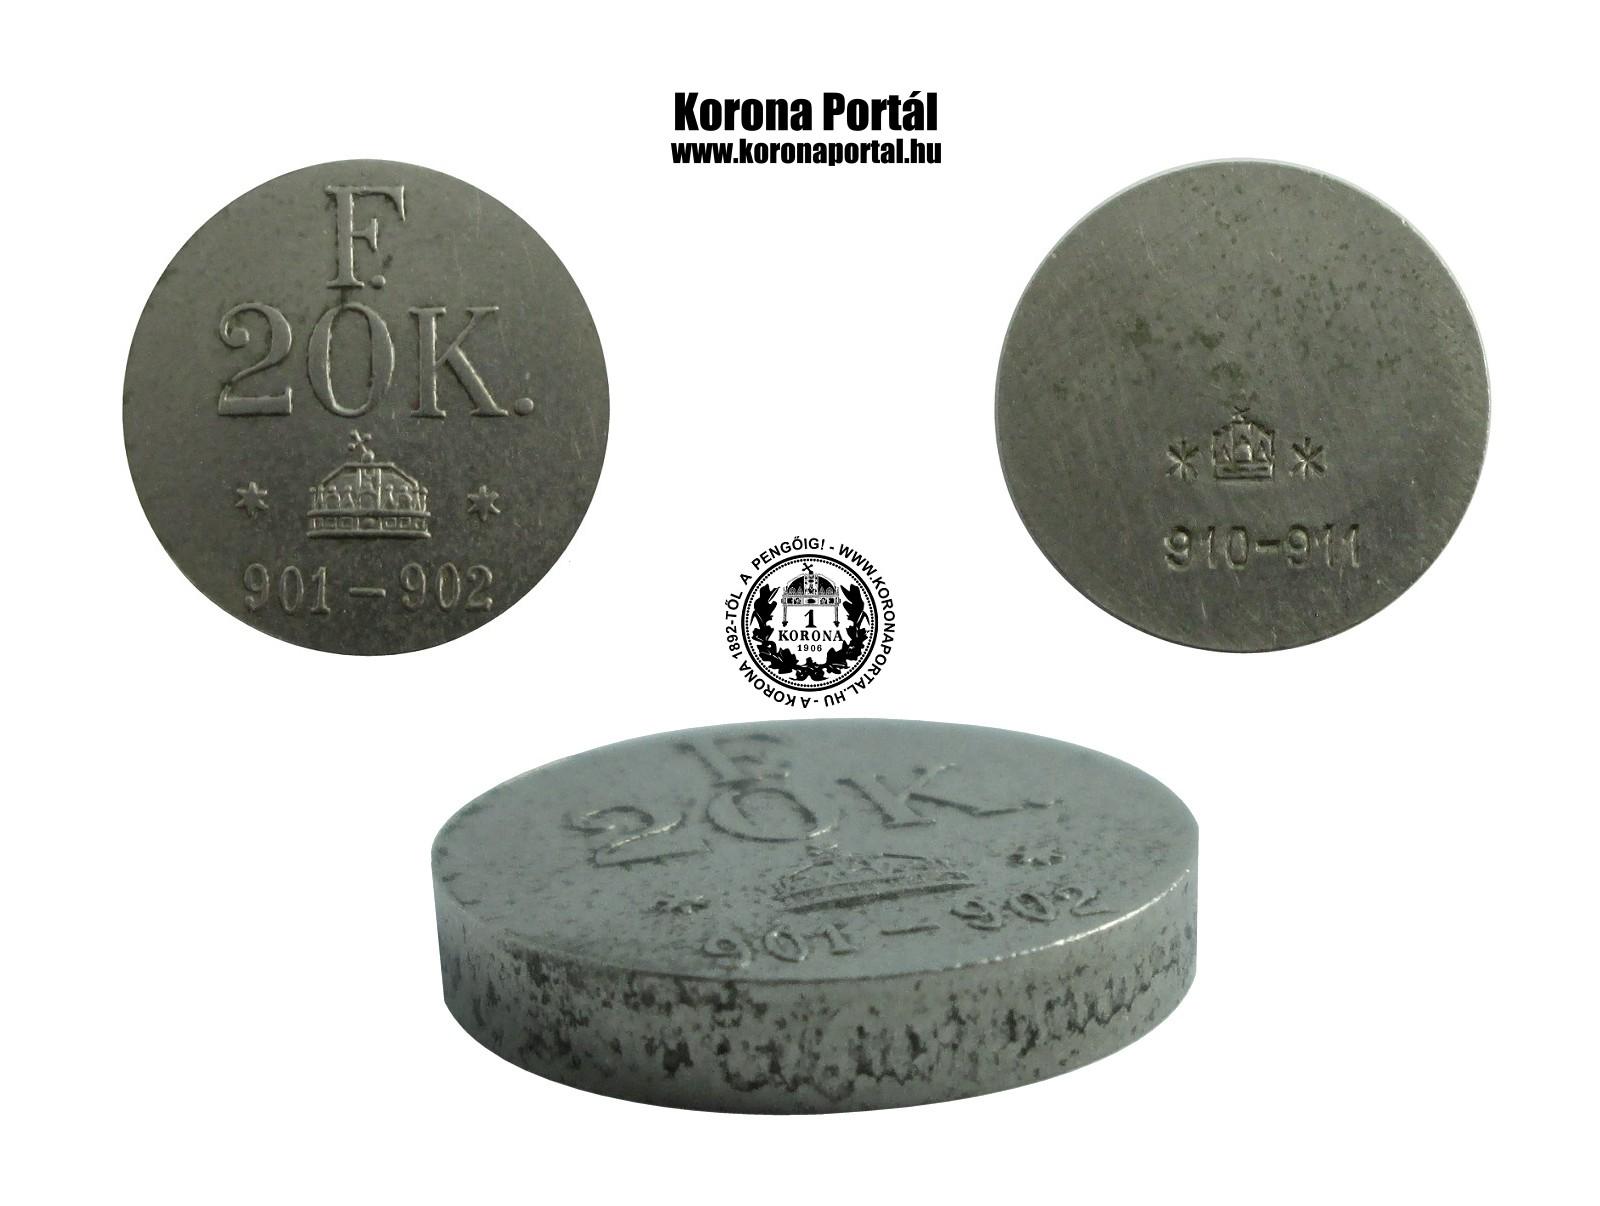 http://www.koronaportal.hu/penzsuly-sulypenz/www_koronaportal_hu_penzsuly-sulypenz-arany-20-korona-20k-f-901-902_vastag.jpg